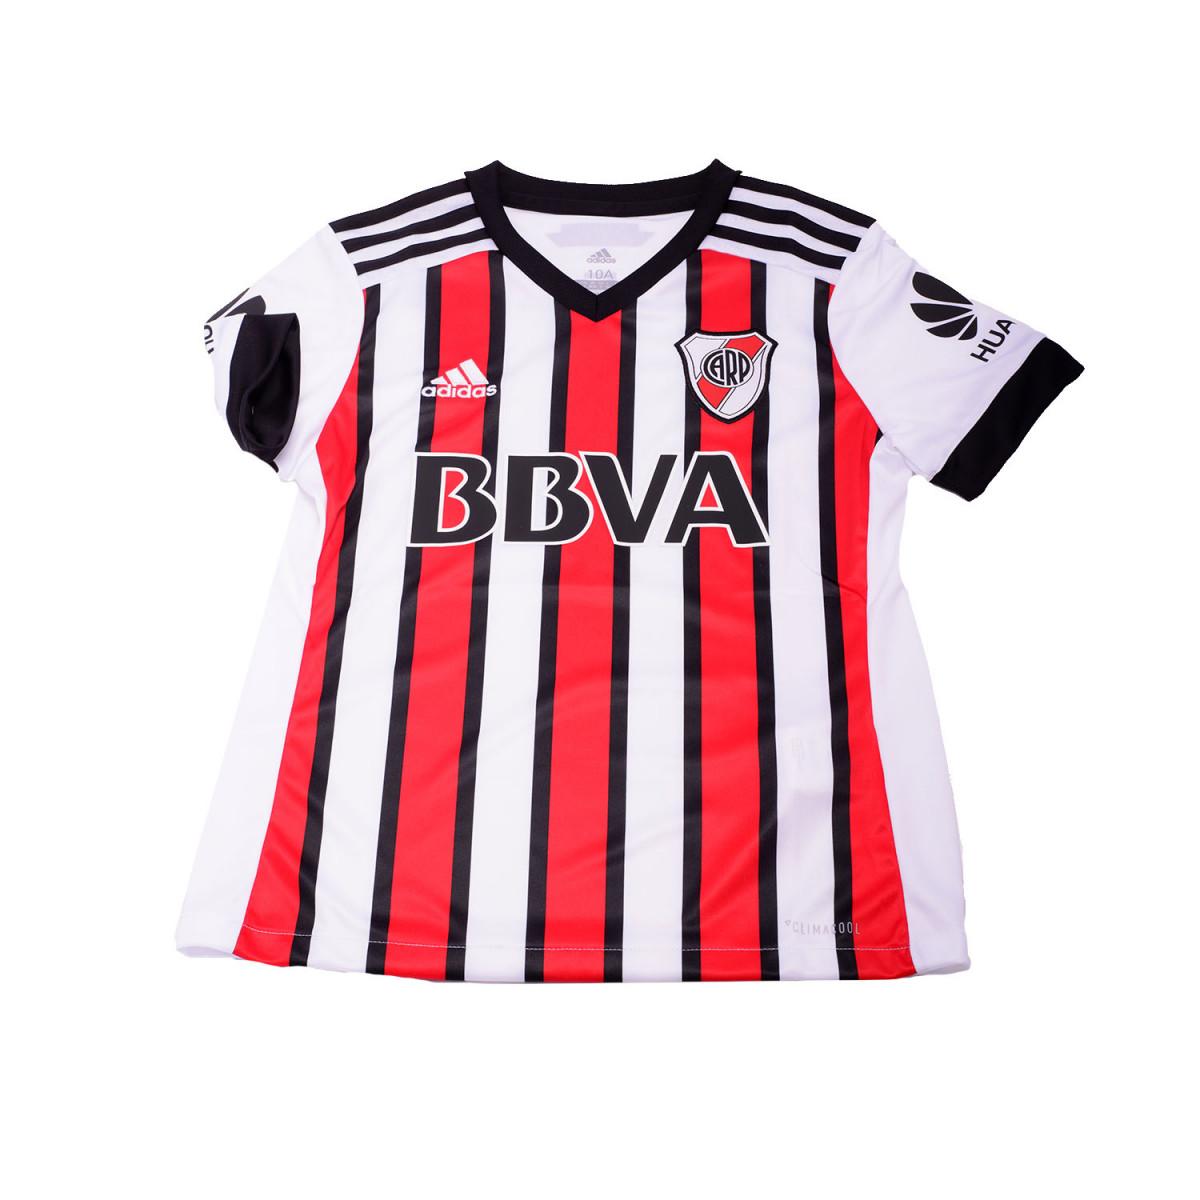 Camiseta Adidas River Plate 2018